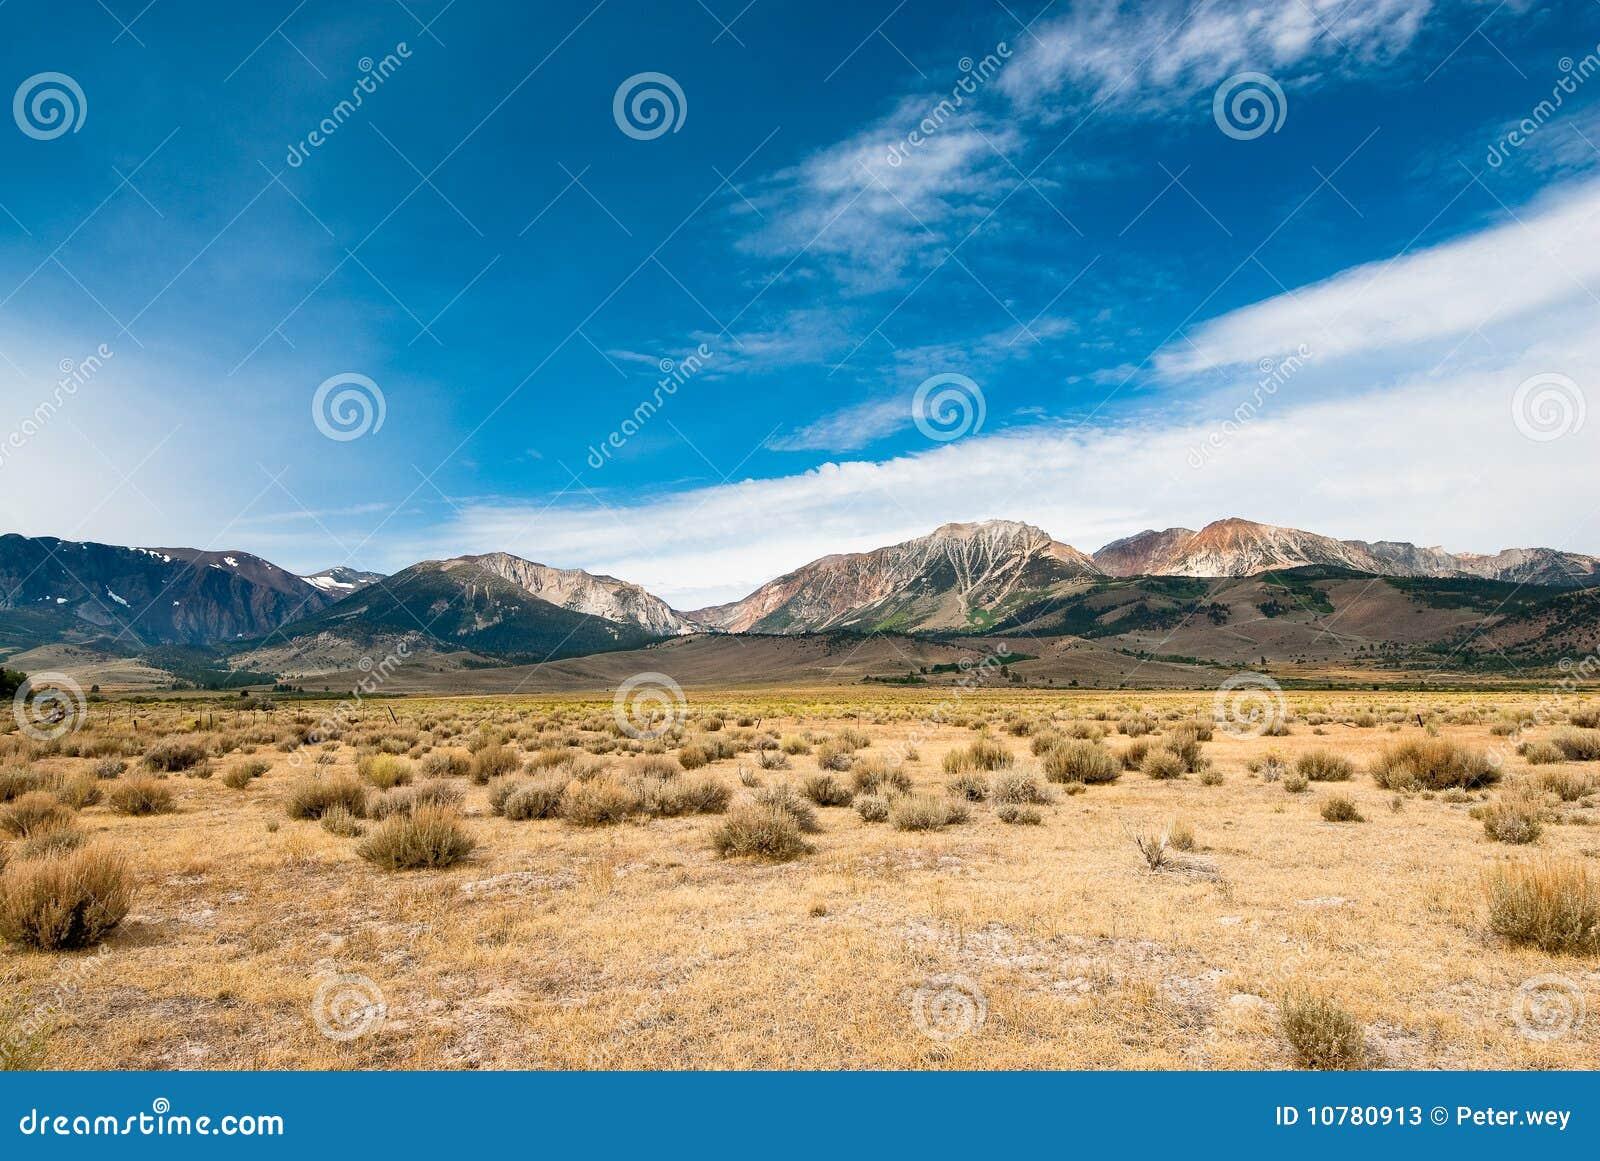 Siërra bergen